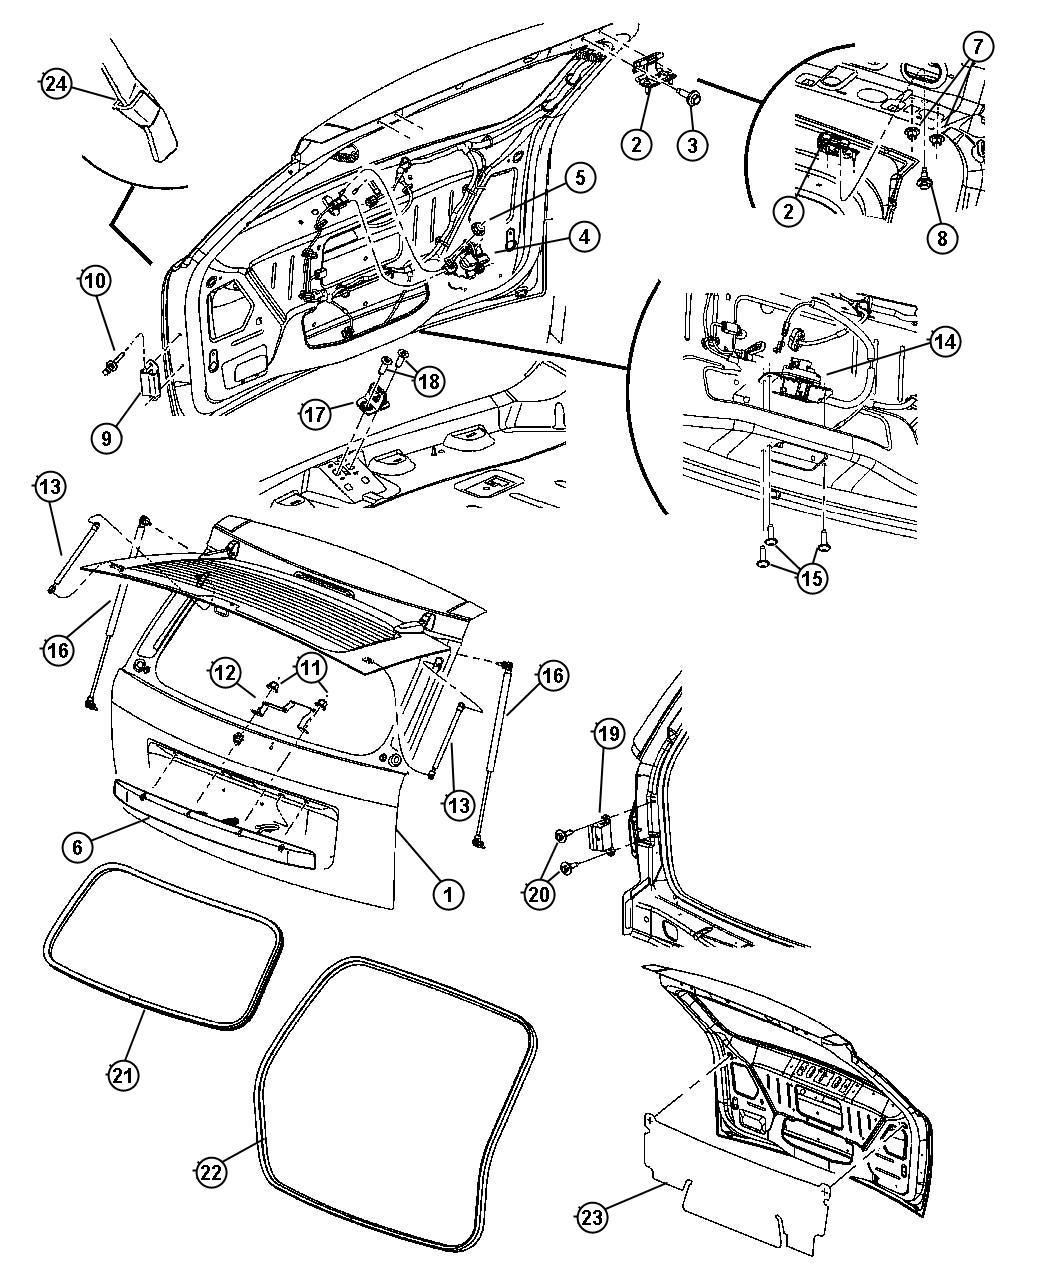 2006 Jeep Grand Cherokee Handle. Liftgate. [psb]. Color